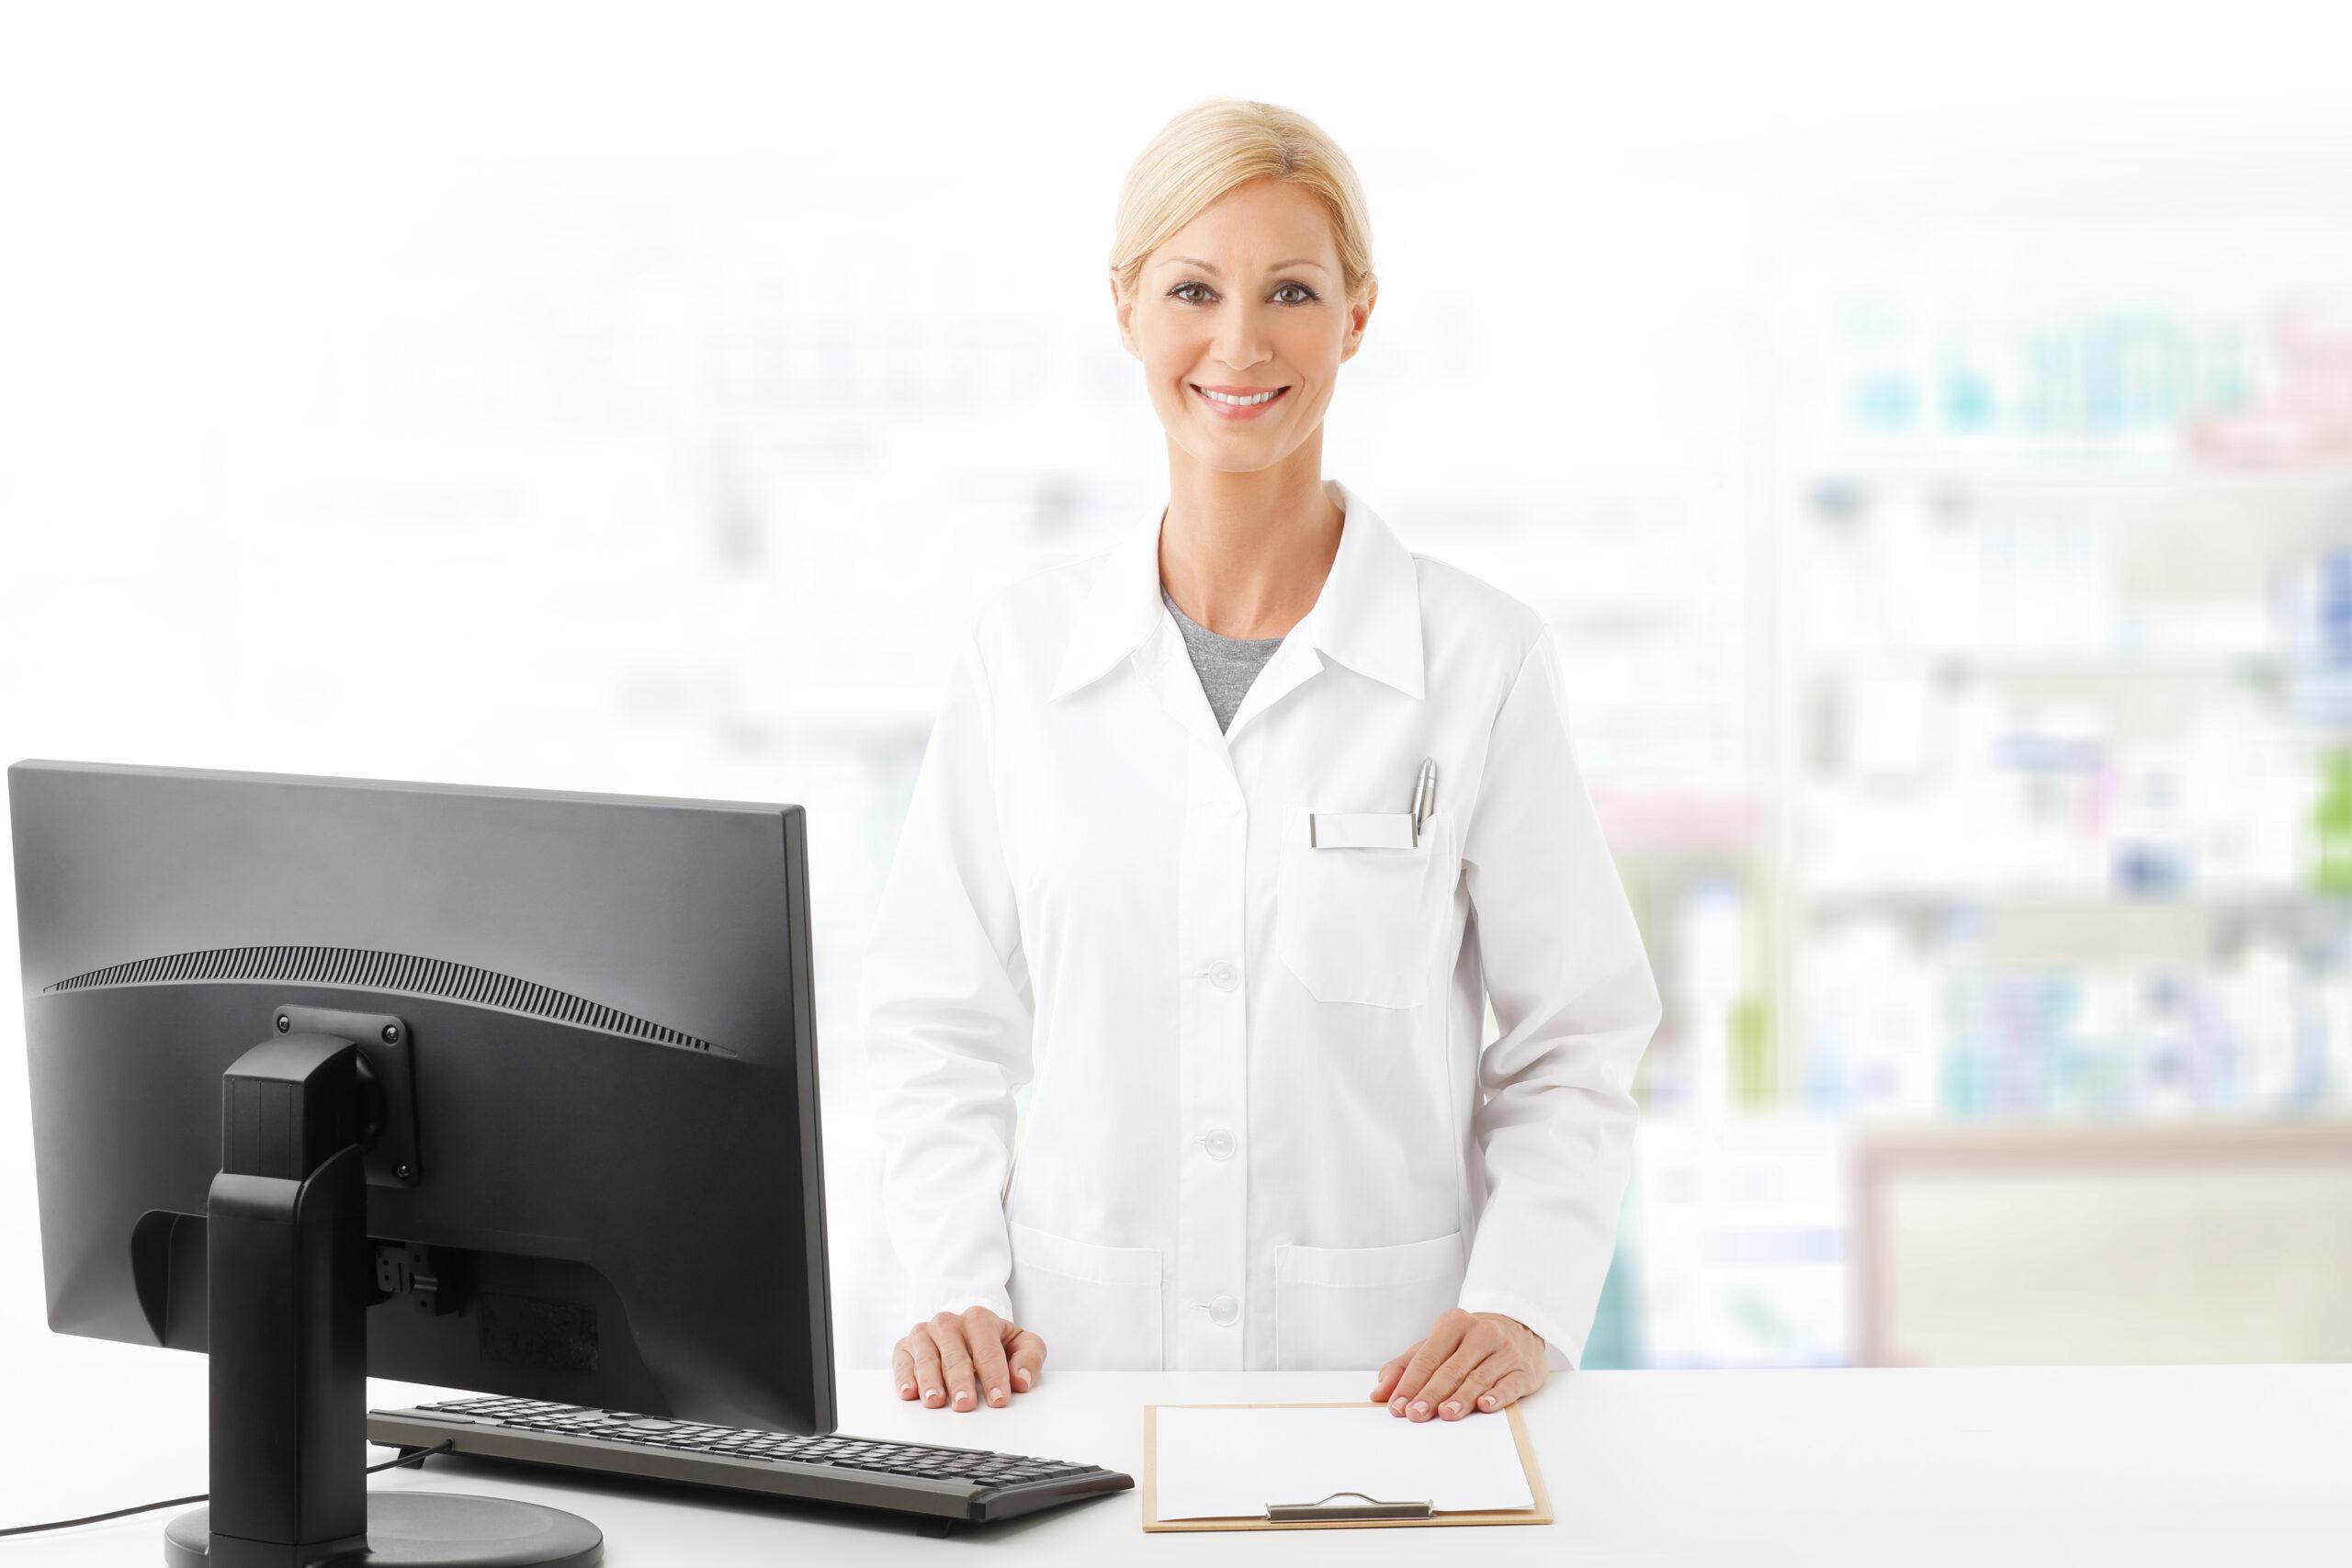 female pharmacy clerk at checkout smiling